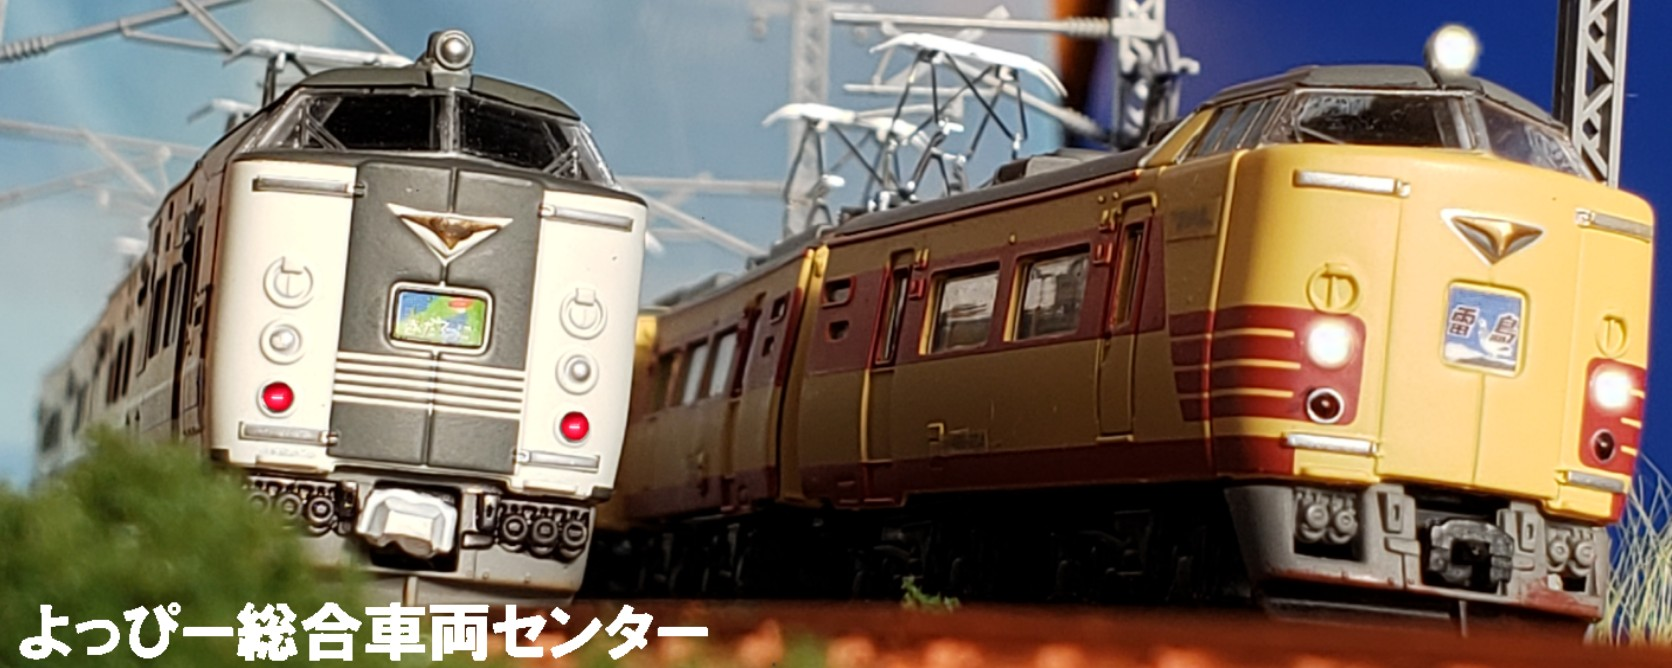 f:id:KAKOGAWA-YS:20201229174515j:image